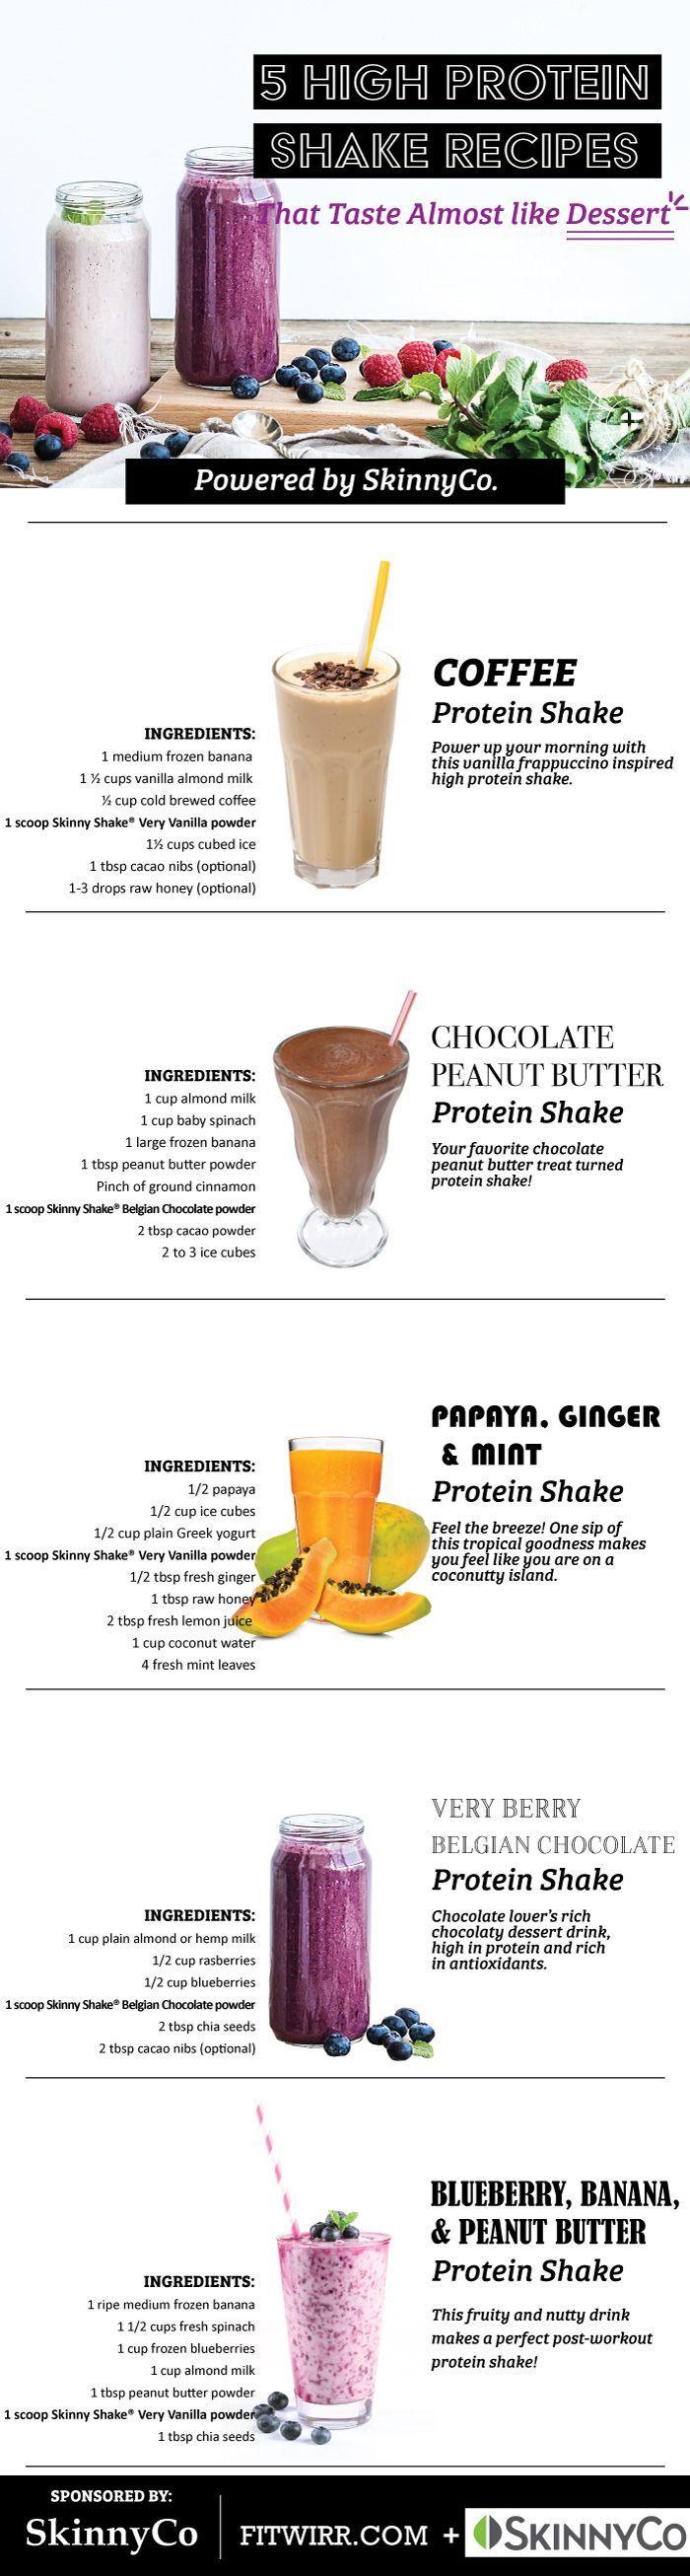 #delicious #protein #recipes #dessert #shake #taste #high #that #more #like5 High Protein Shake Recipes That Taste More like Dessert 5 high protein shake recipes that taste delicious5 high protein shake recipes that taste delicious #proteinshakes